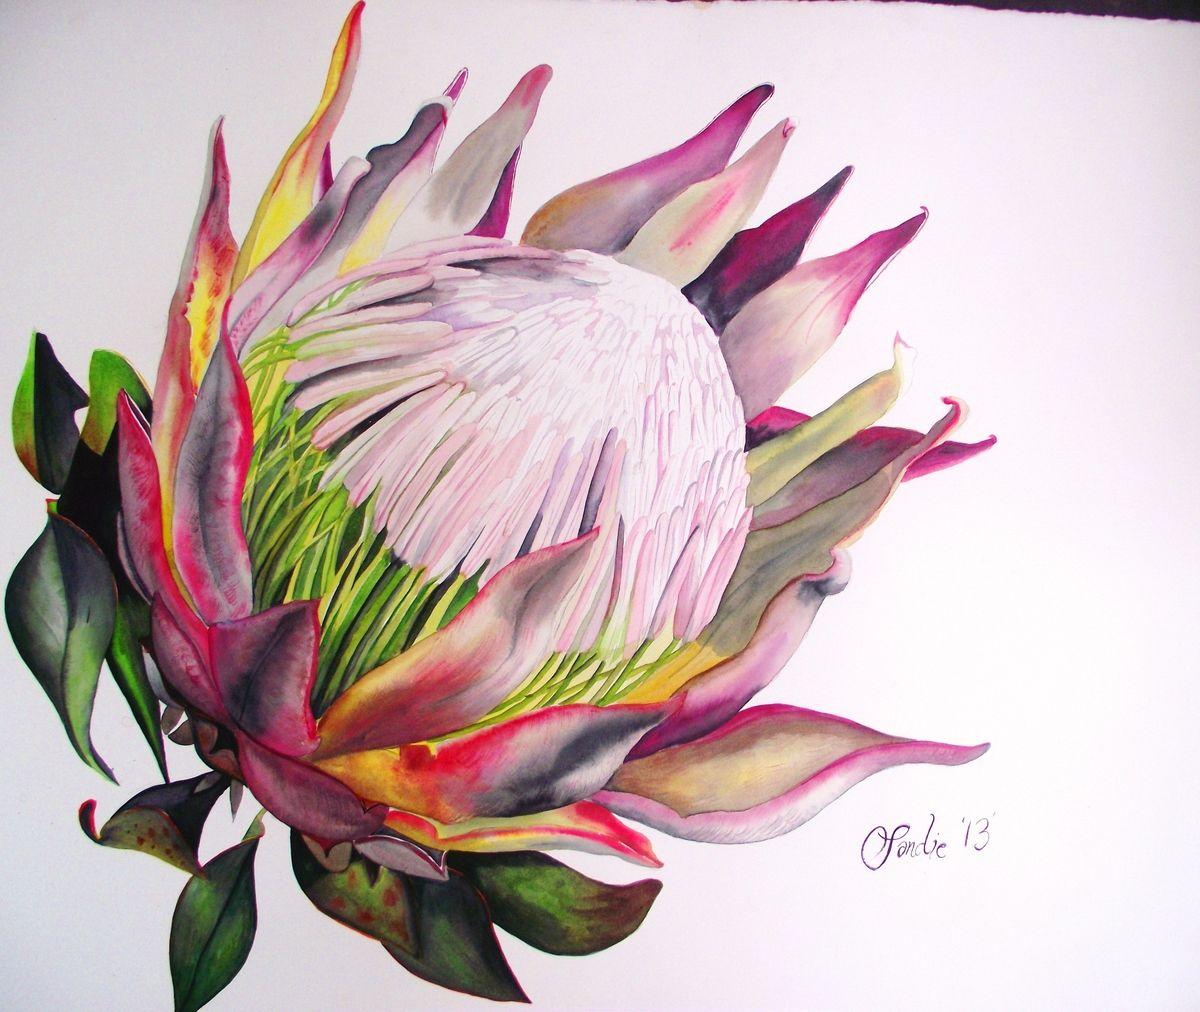 Protea Sandie Copland Portfolio The Loop Protea Art Botanical Painting Flower Painting